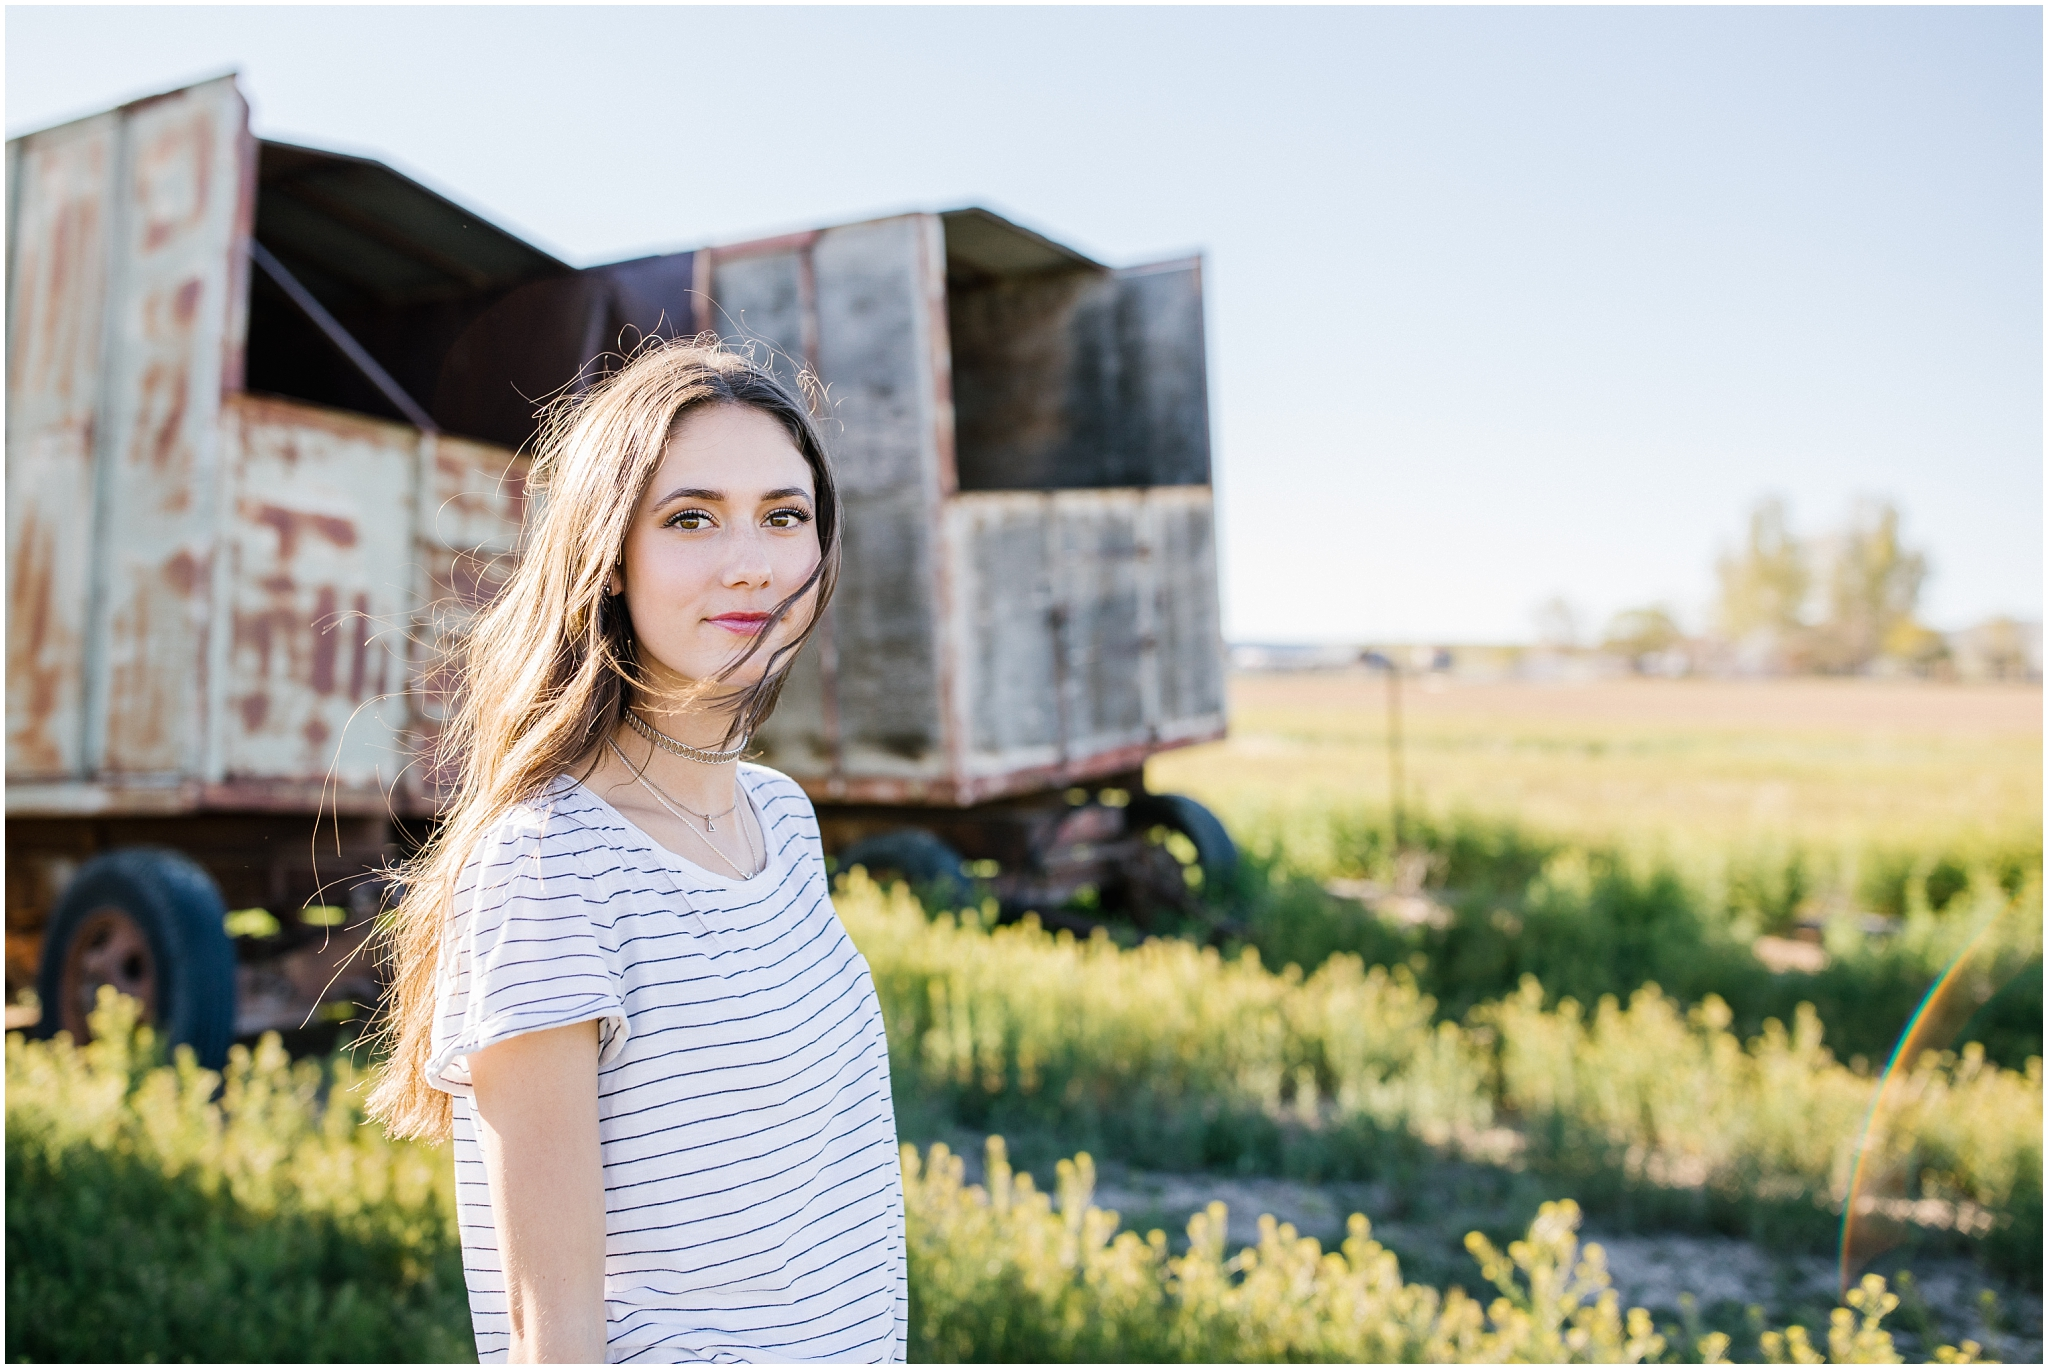 Lizzie-B-Imagery-Utah-Senior-Photographer-Central- Utah-Photographer-Utah-County_0002.jpg